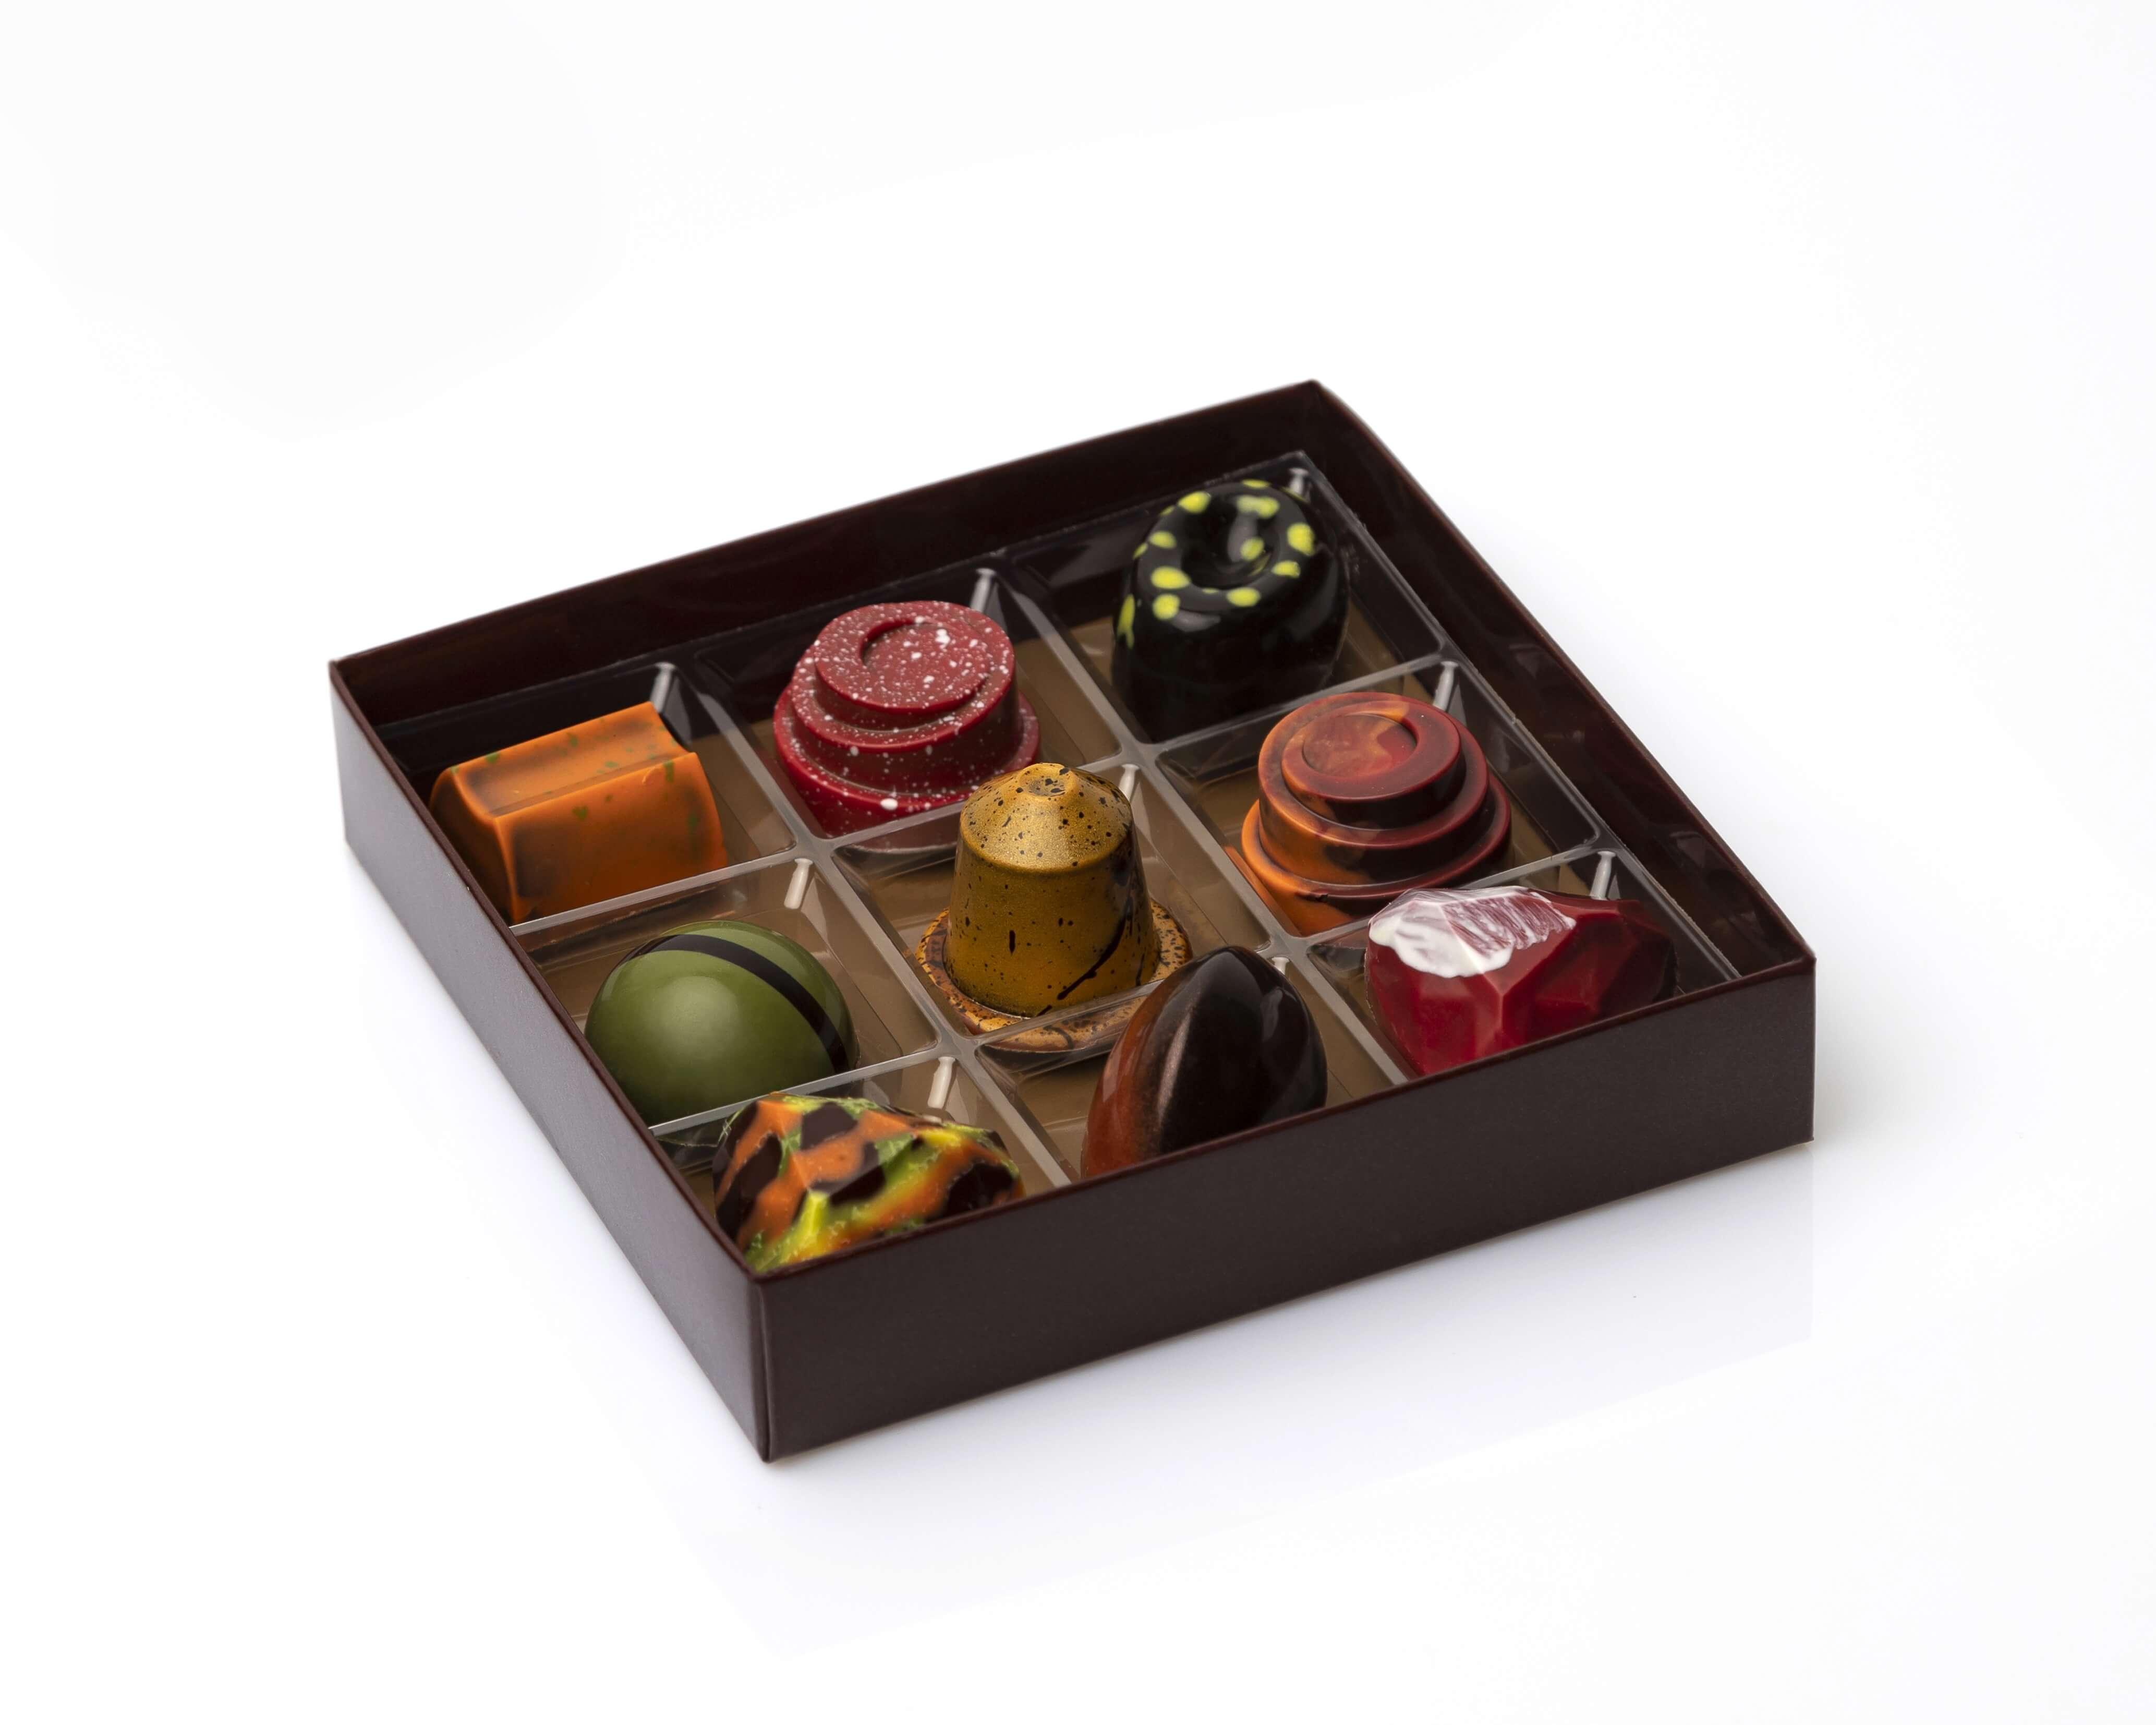 Bombones artesanos trufas de chocolate coruña chocolatería coruña bombones